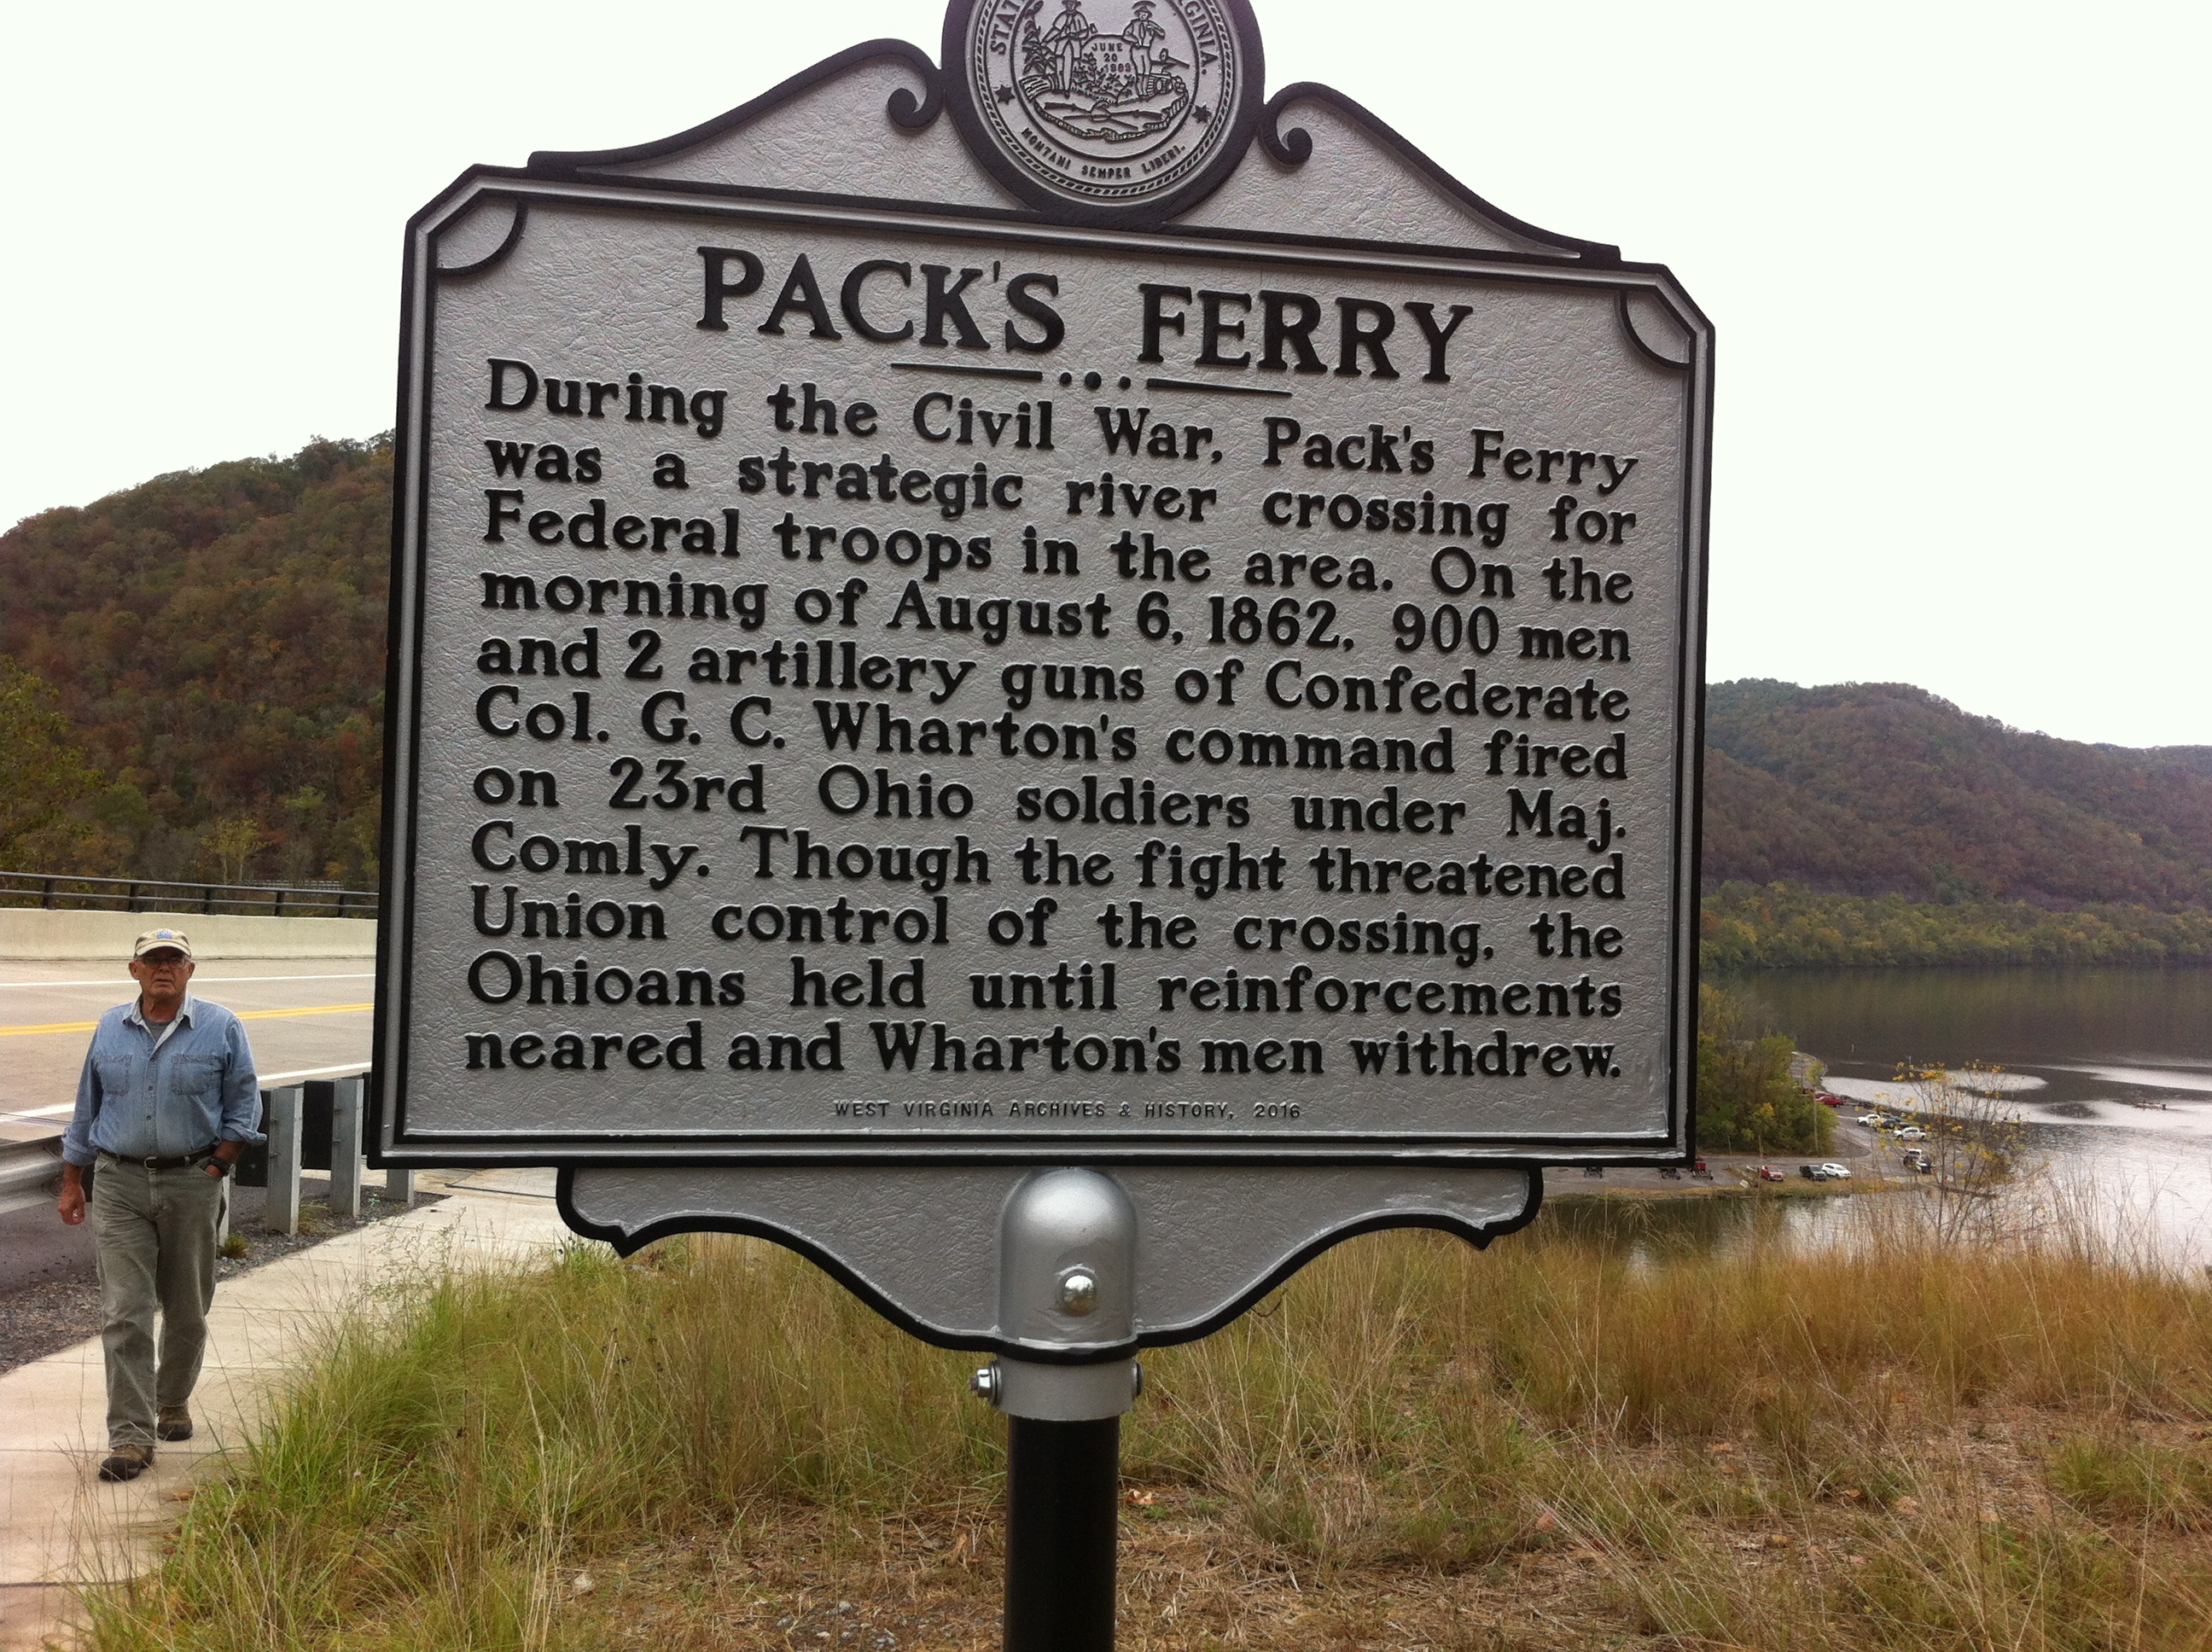 packs ferry